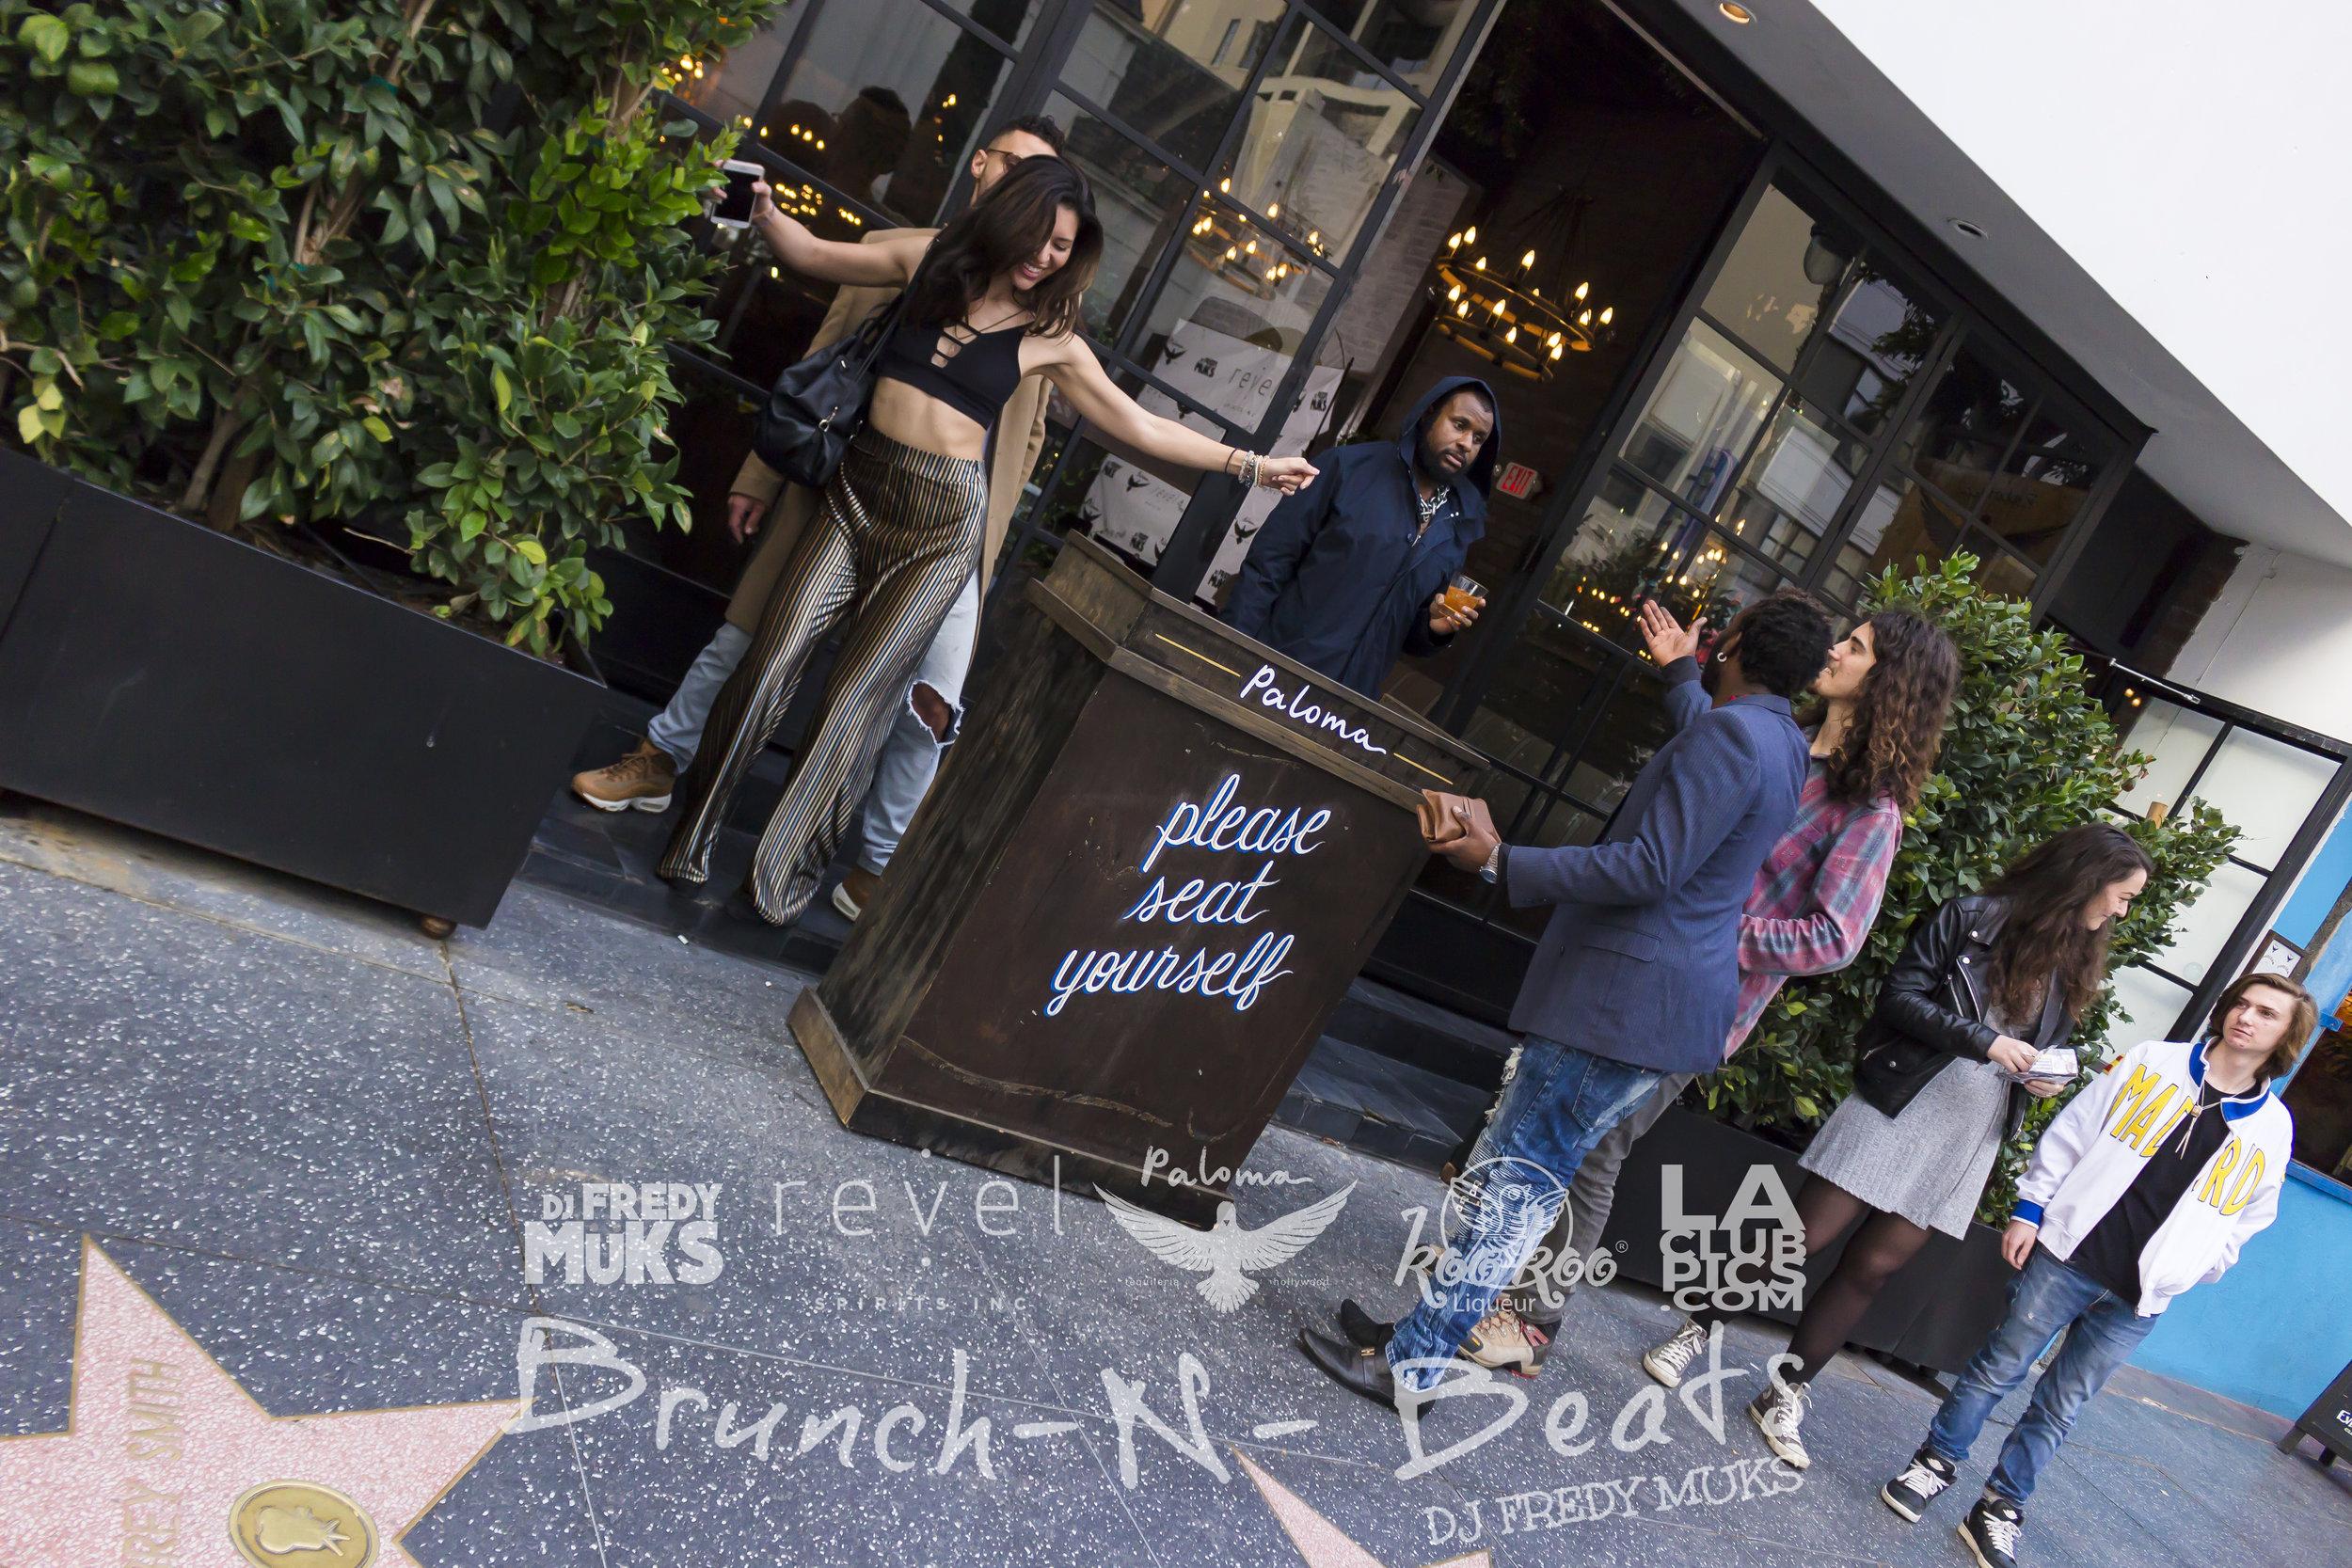 Brunch-N-Beats - 03-11-18_209.jpg